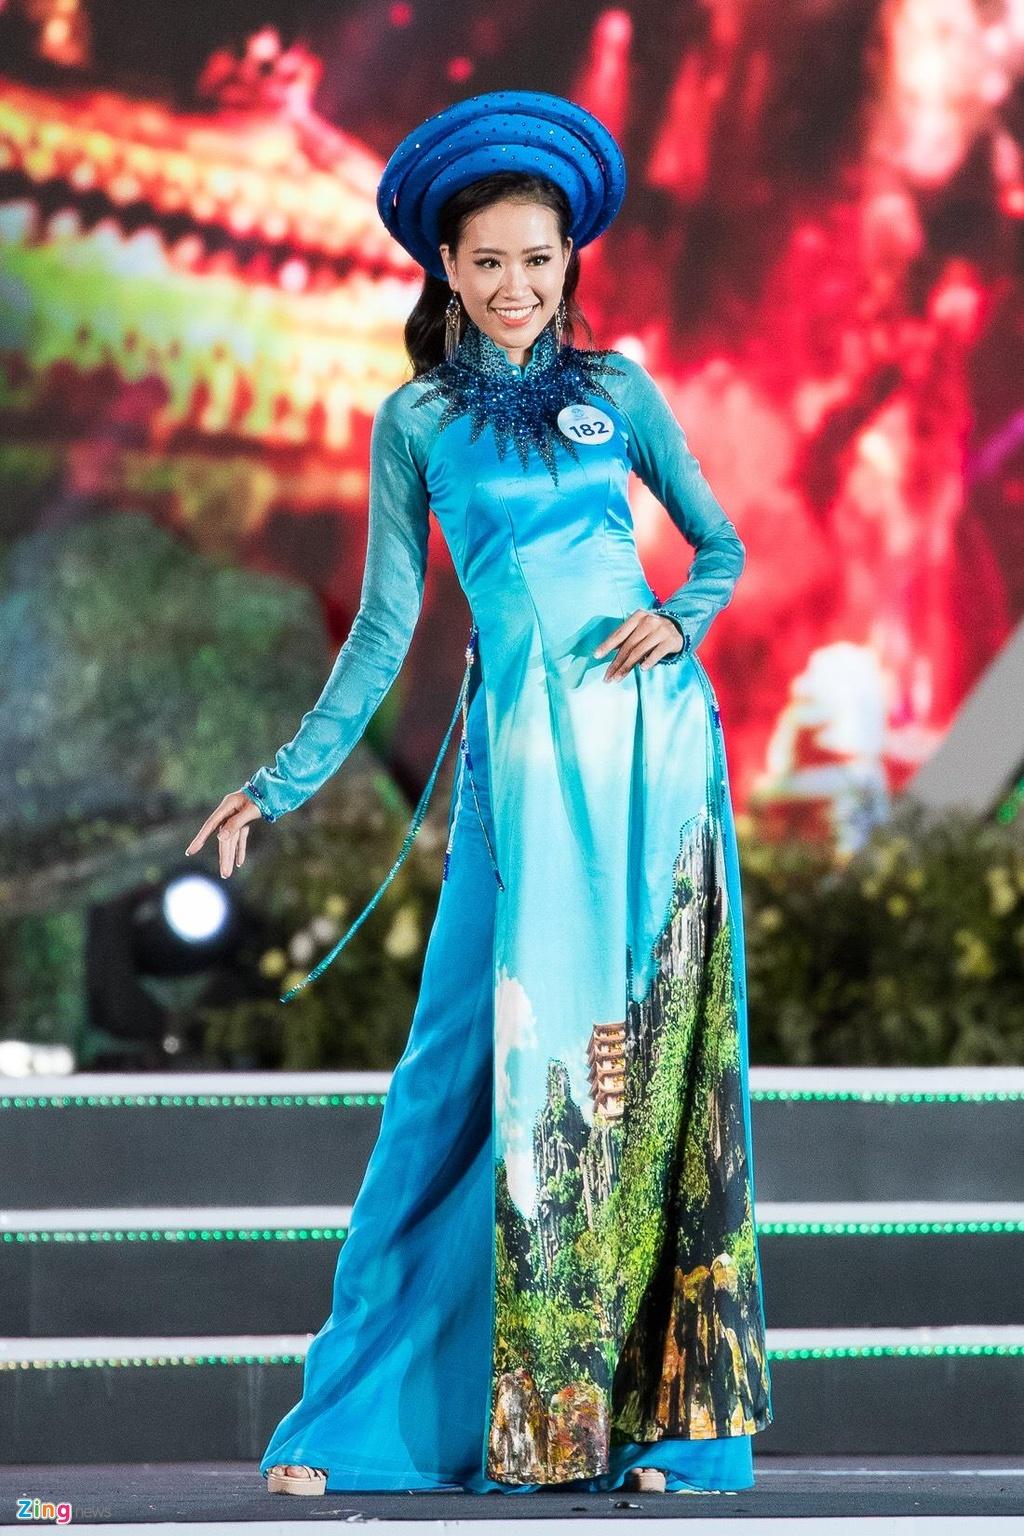 Thi sinh Hoa hau The gioi Viet Nam dien kieu ky voi ao dai hinh anh 4